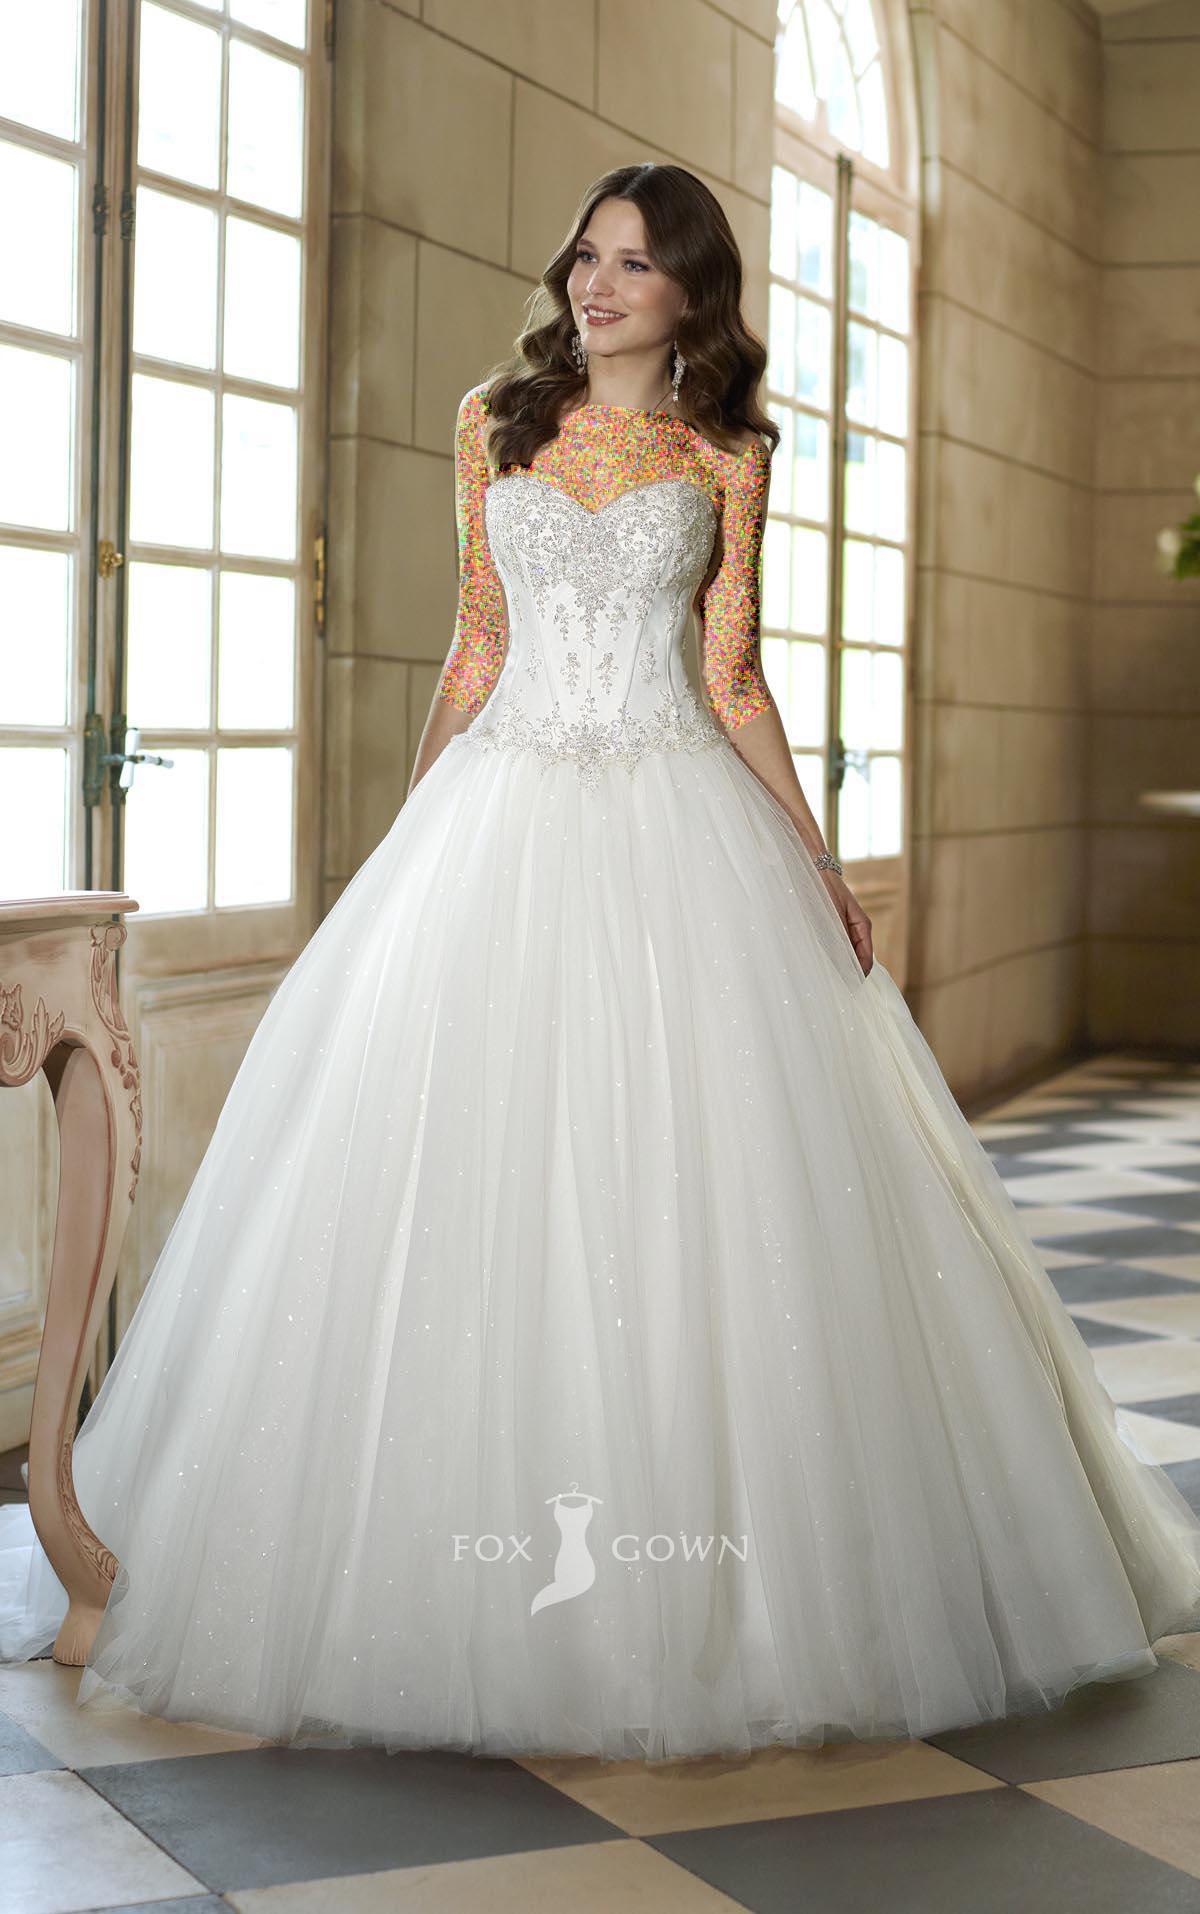 مدل عروس 2015 - httpwww.iran16 (5)